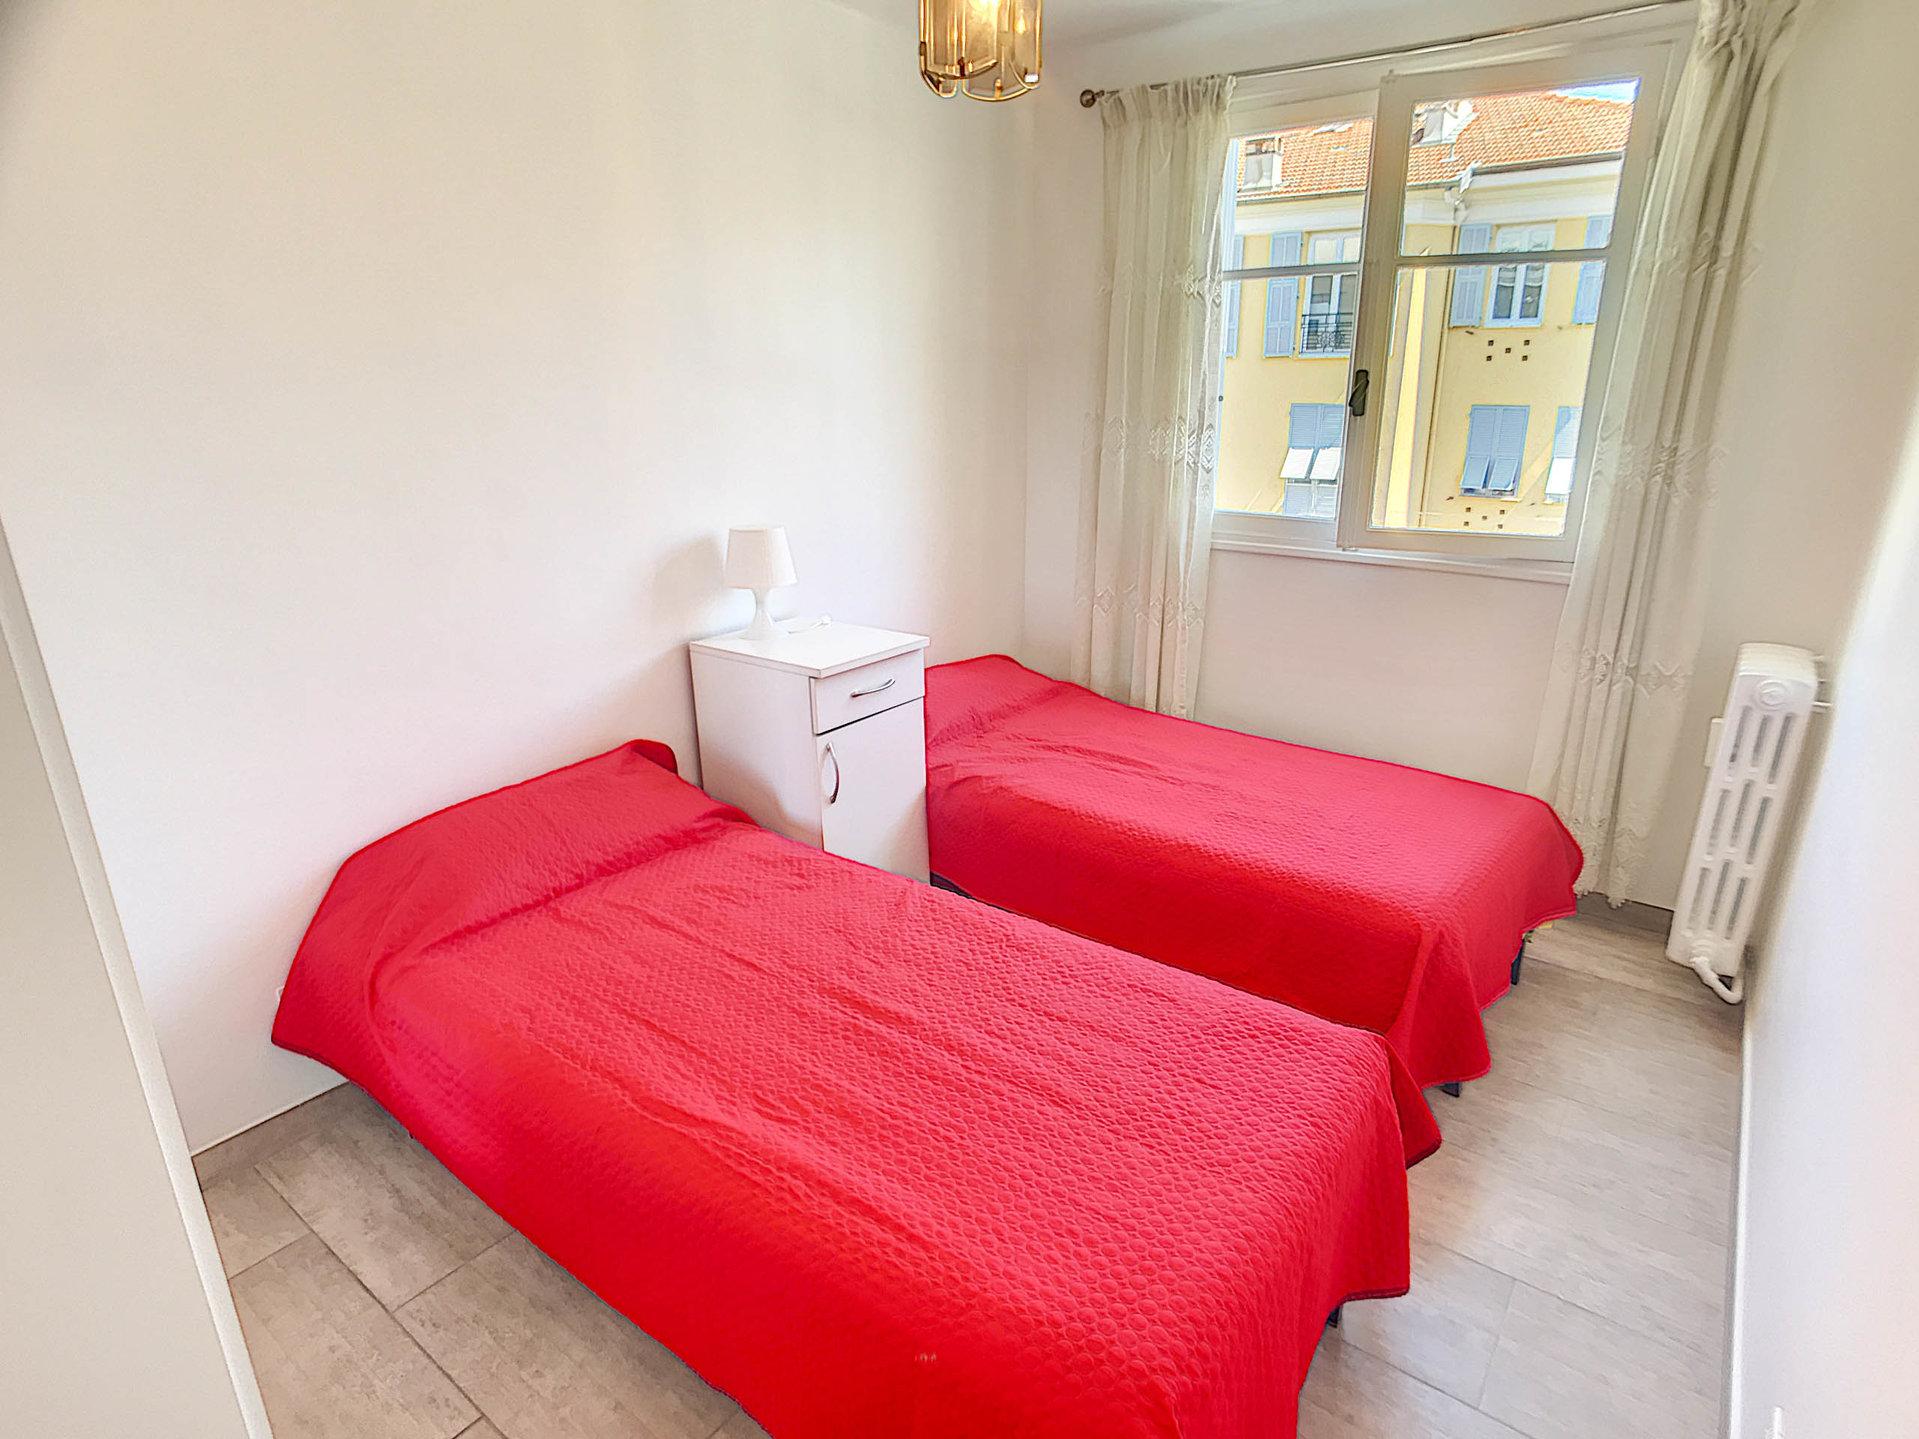 Rental Apartment - Nice Tzarewitch